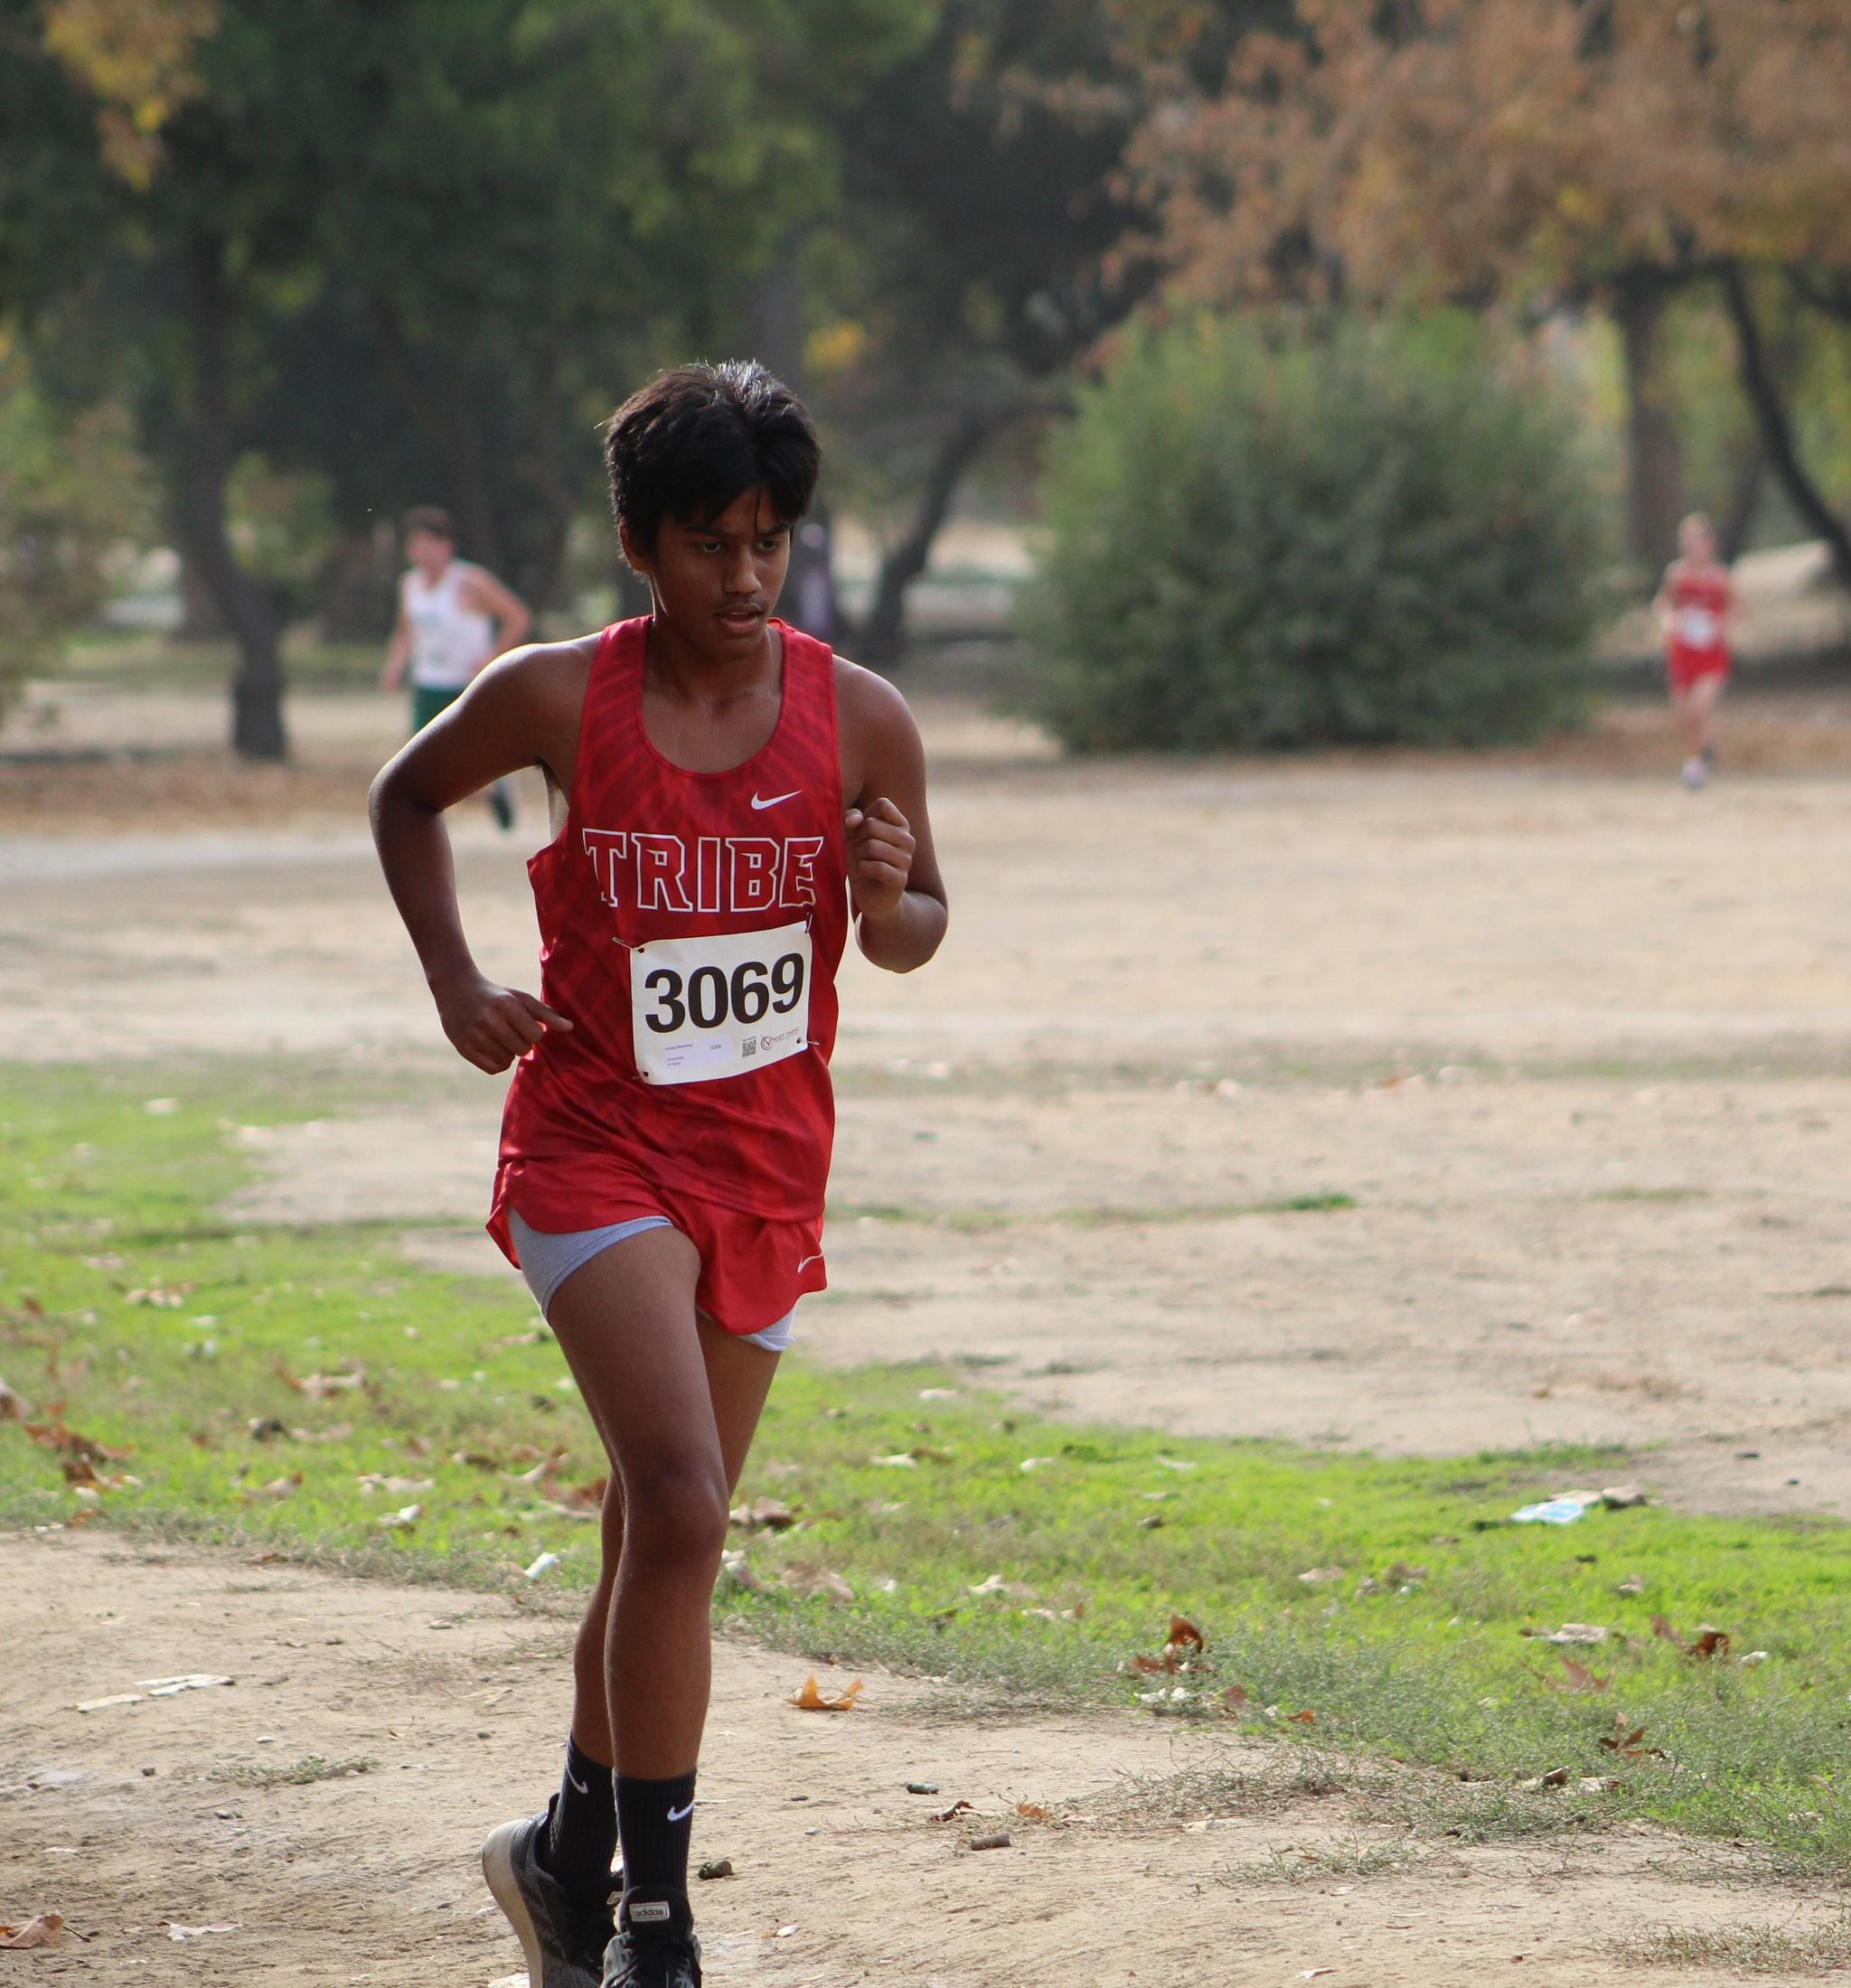 Suneet Bhadwaj running